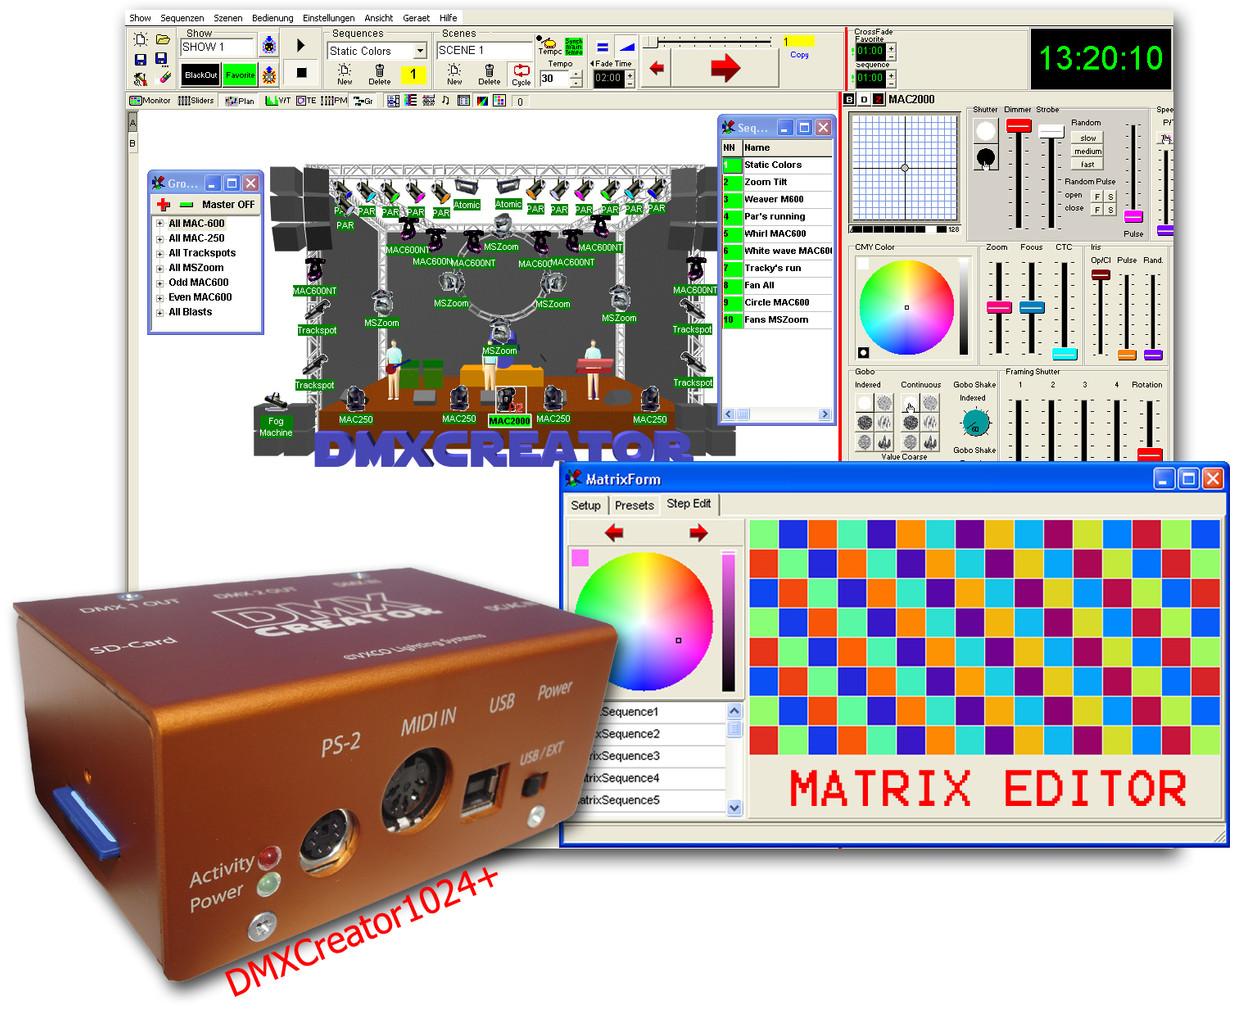 Komposition012008.jpg